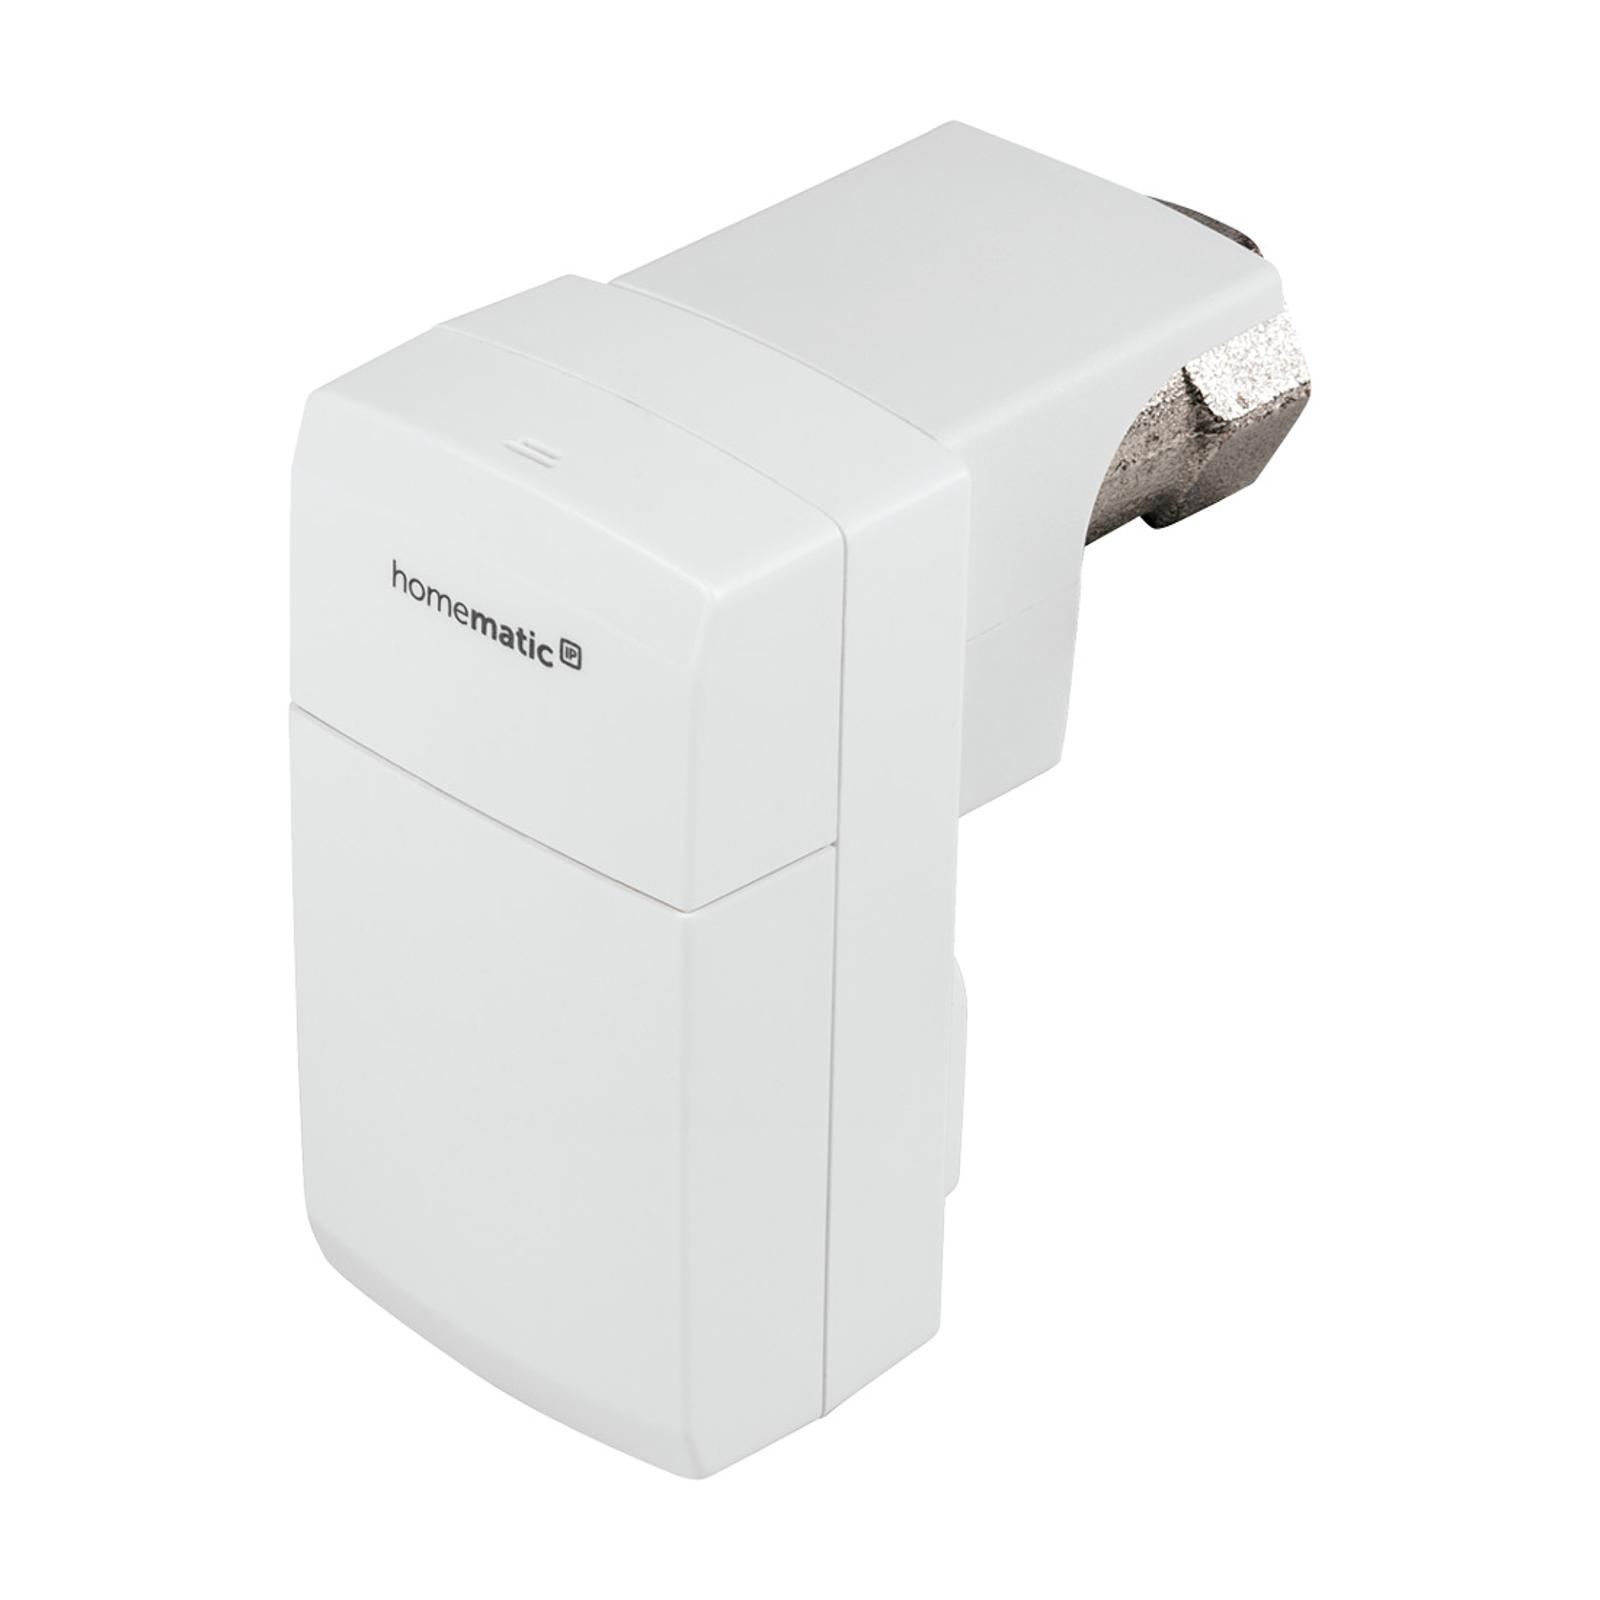 Homematic IP Demontageschutz Thermostat kompakt 5x